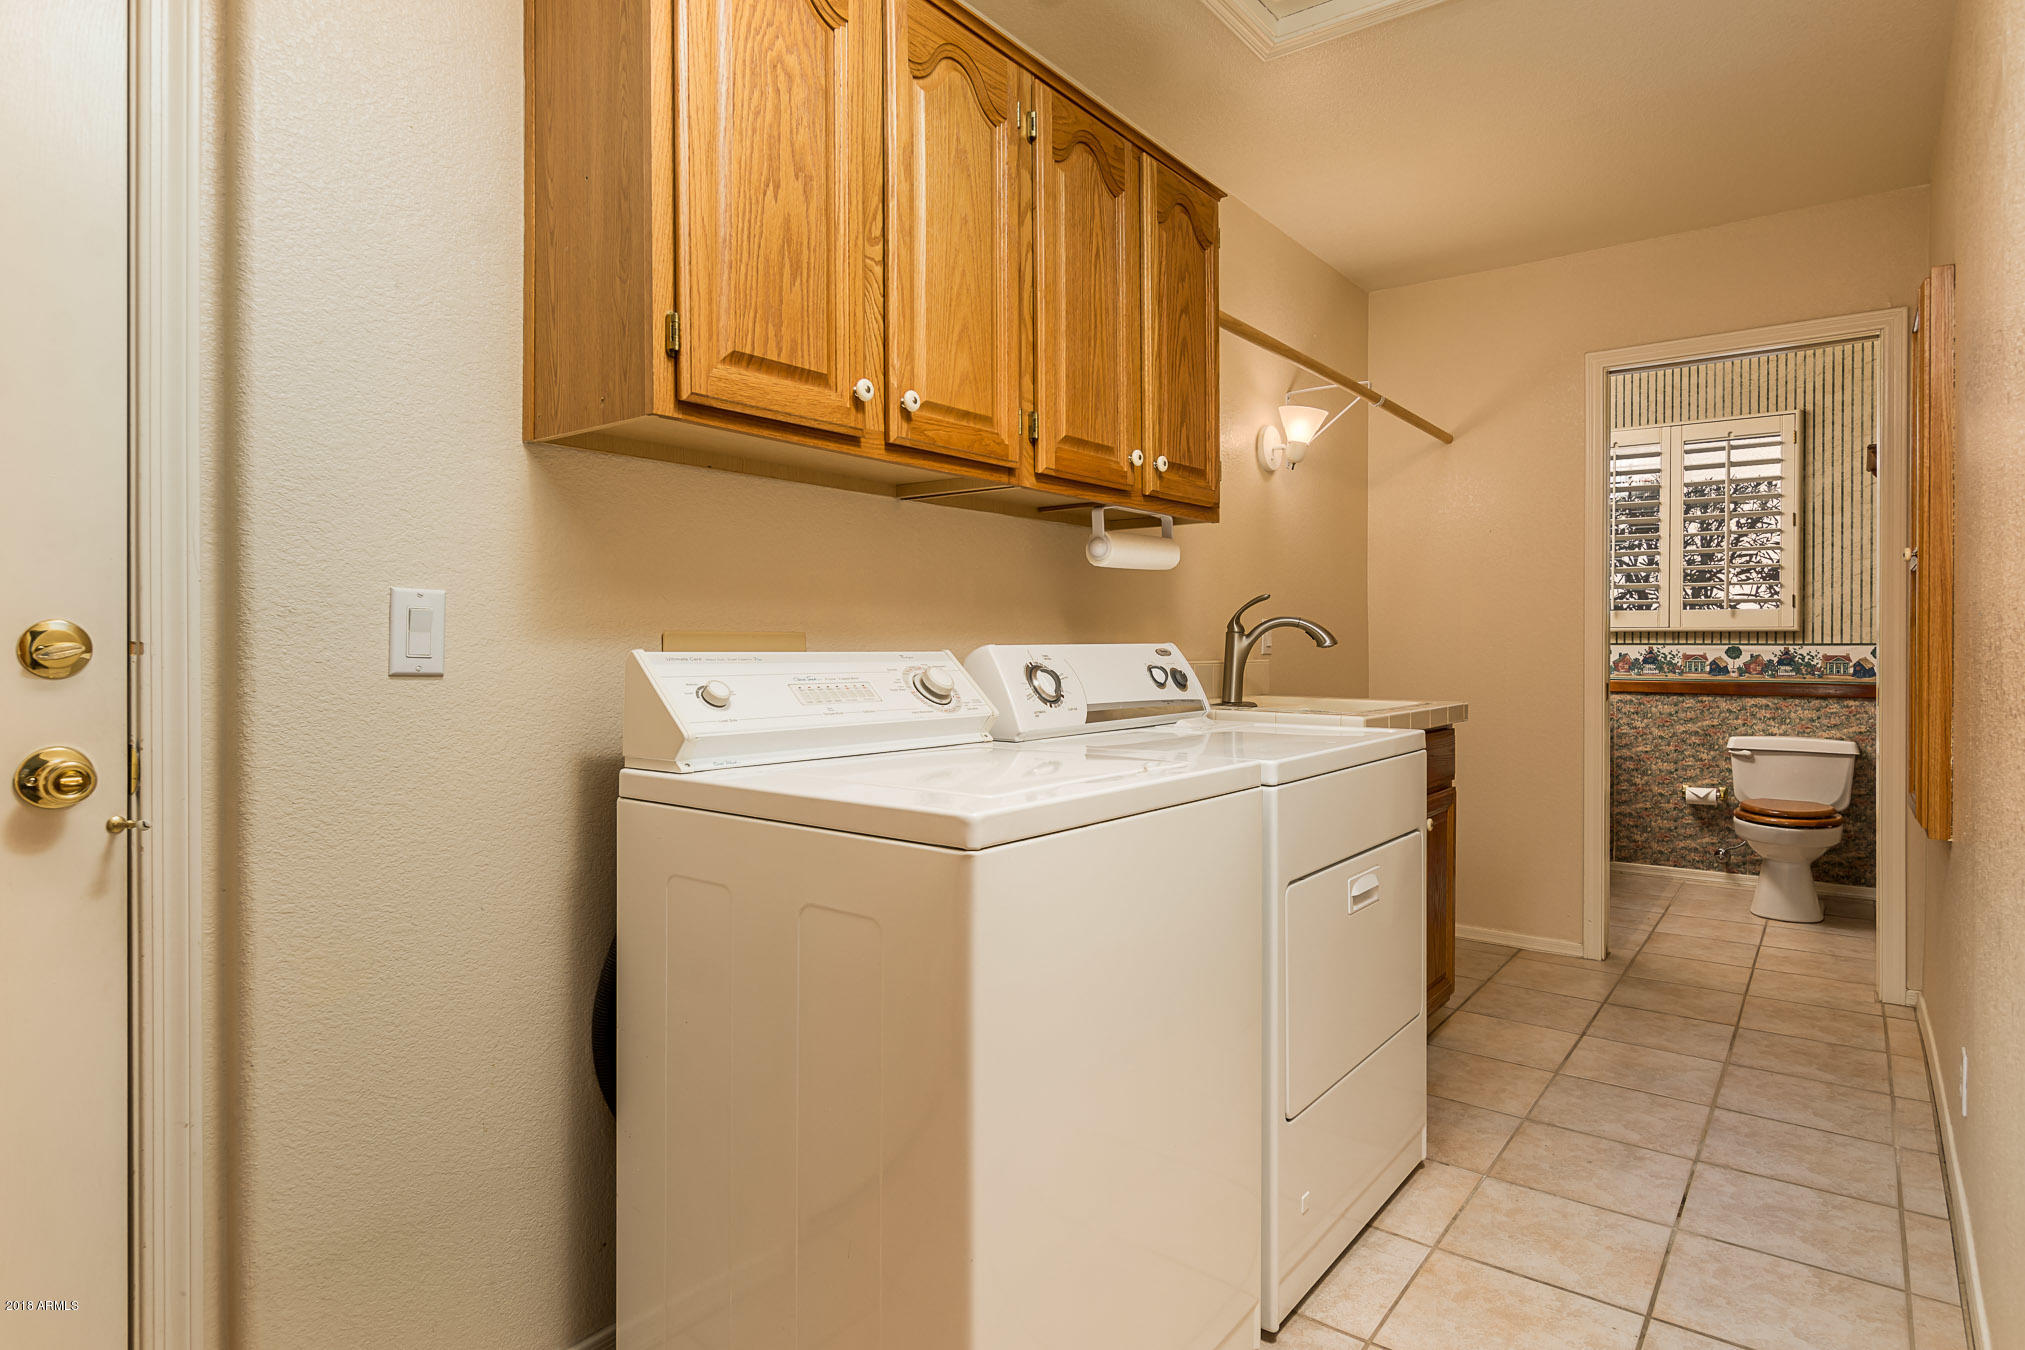 MLS 5813240 8633 W MCRAE Way, Peoria, AZ 85382 Peoria AZ Westbrook Village